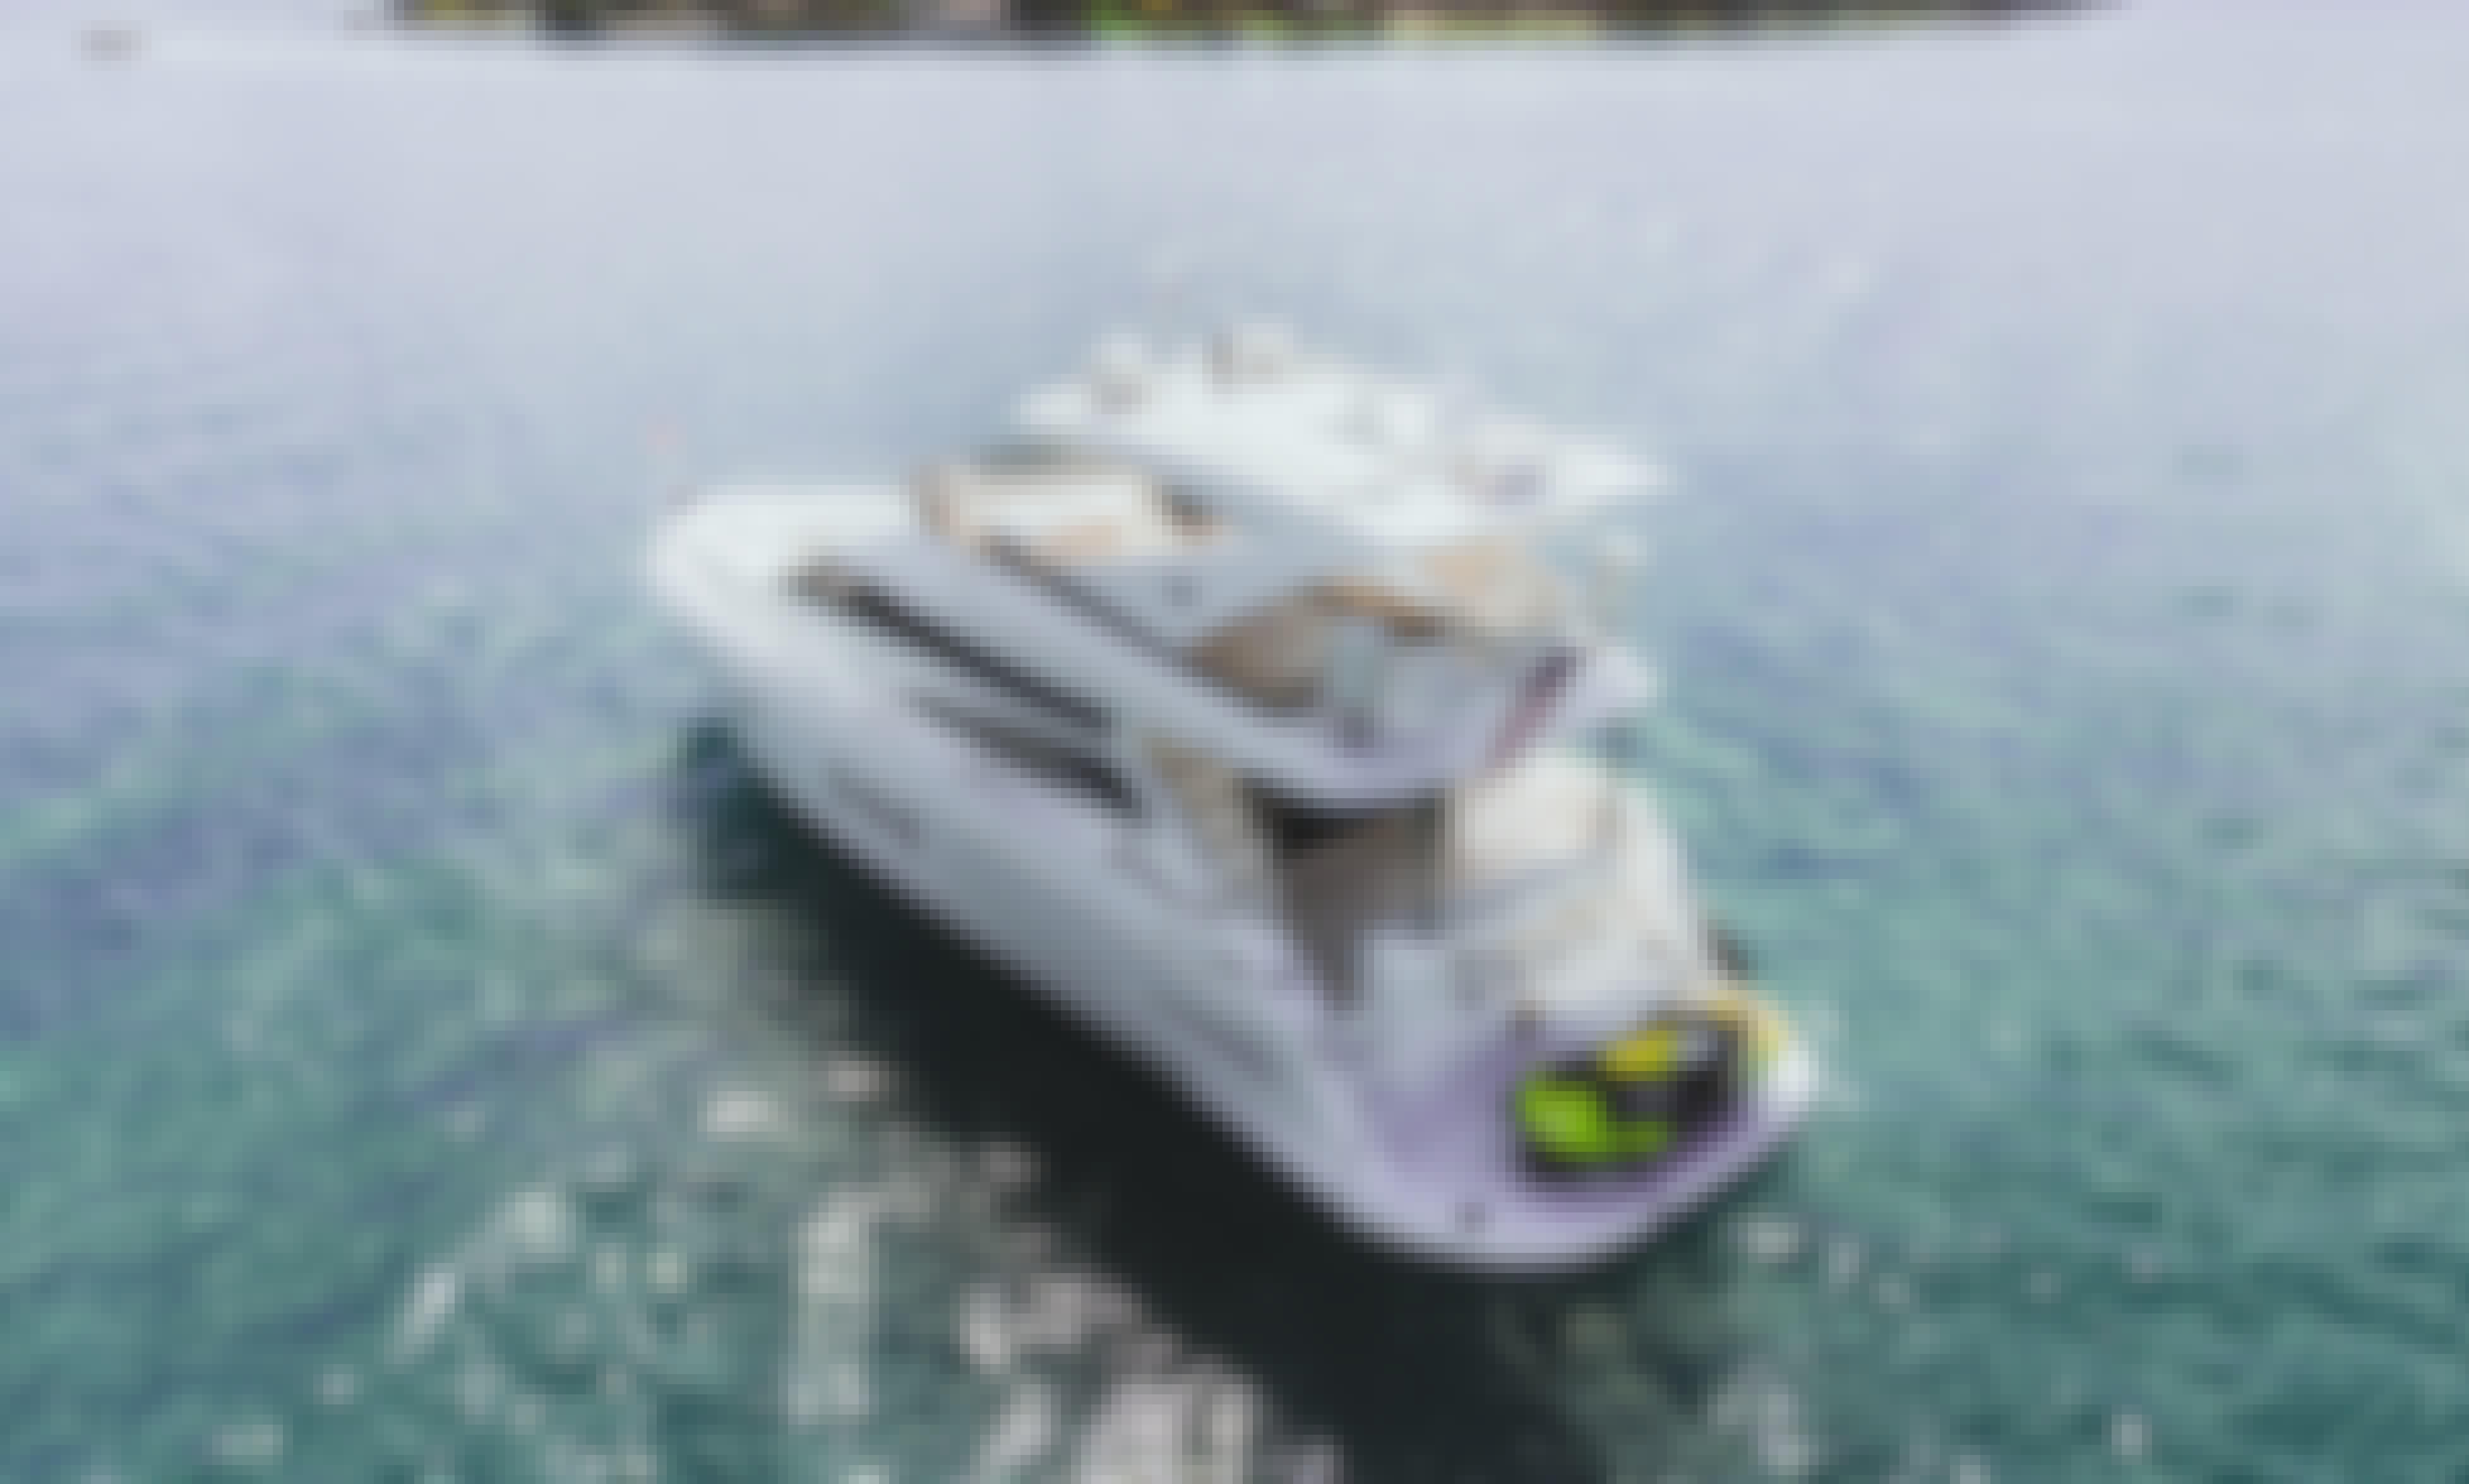 58' Neptunus Flybridge - Miami Party Yacht - Join the Party at Sea!